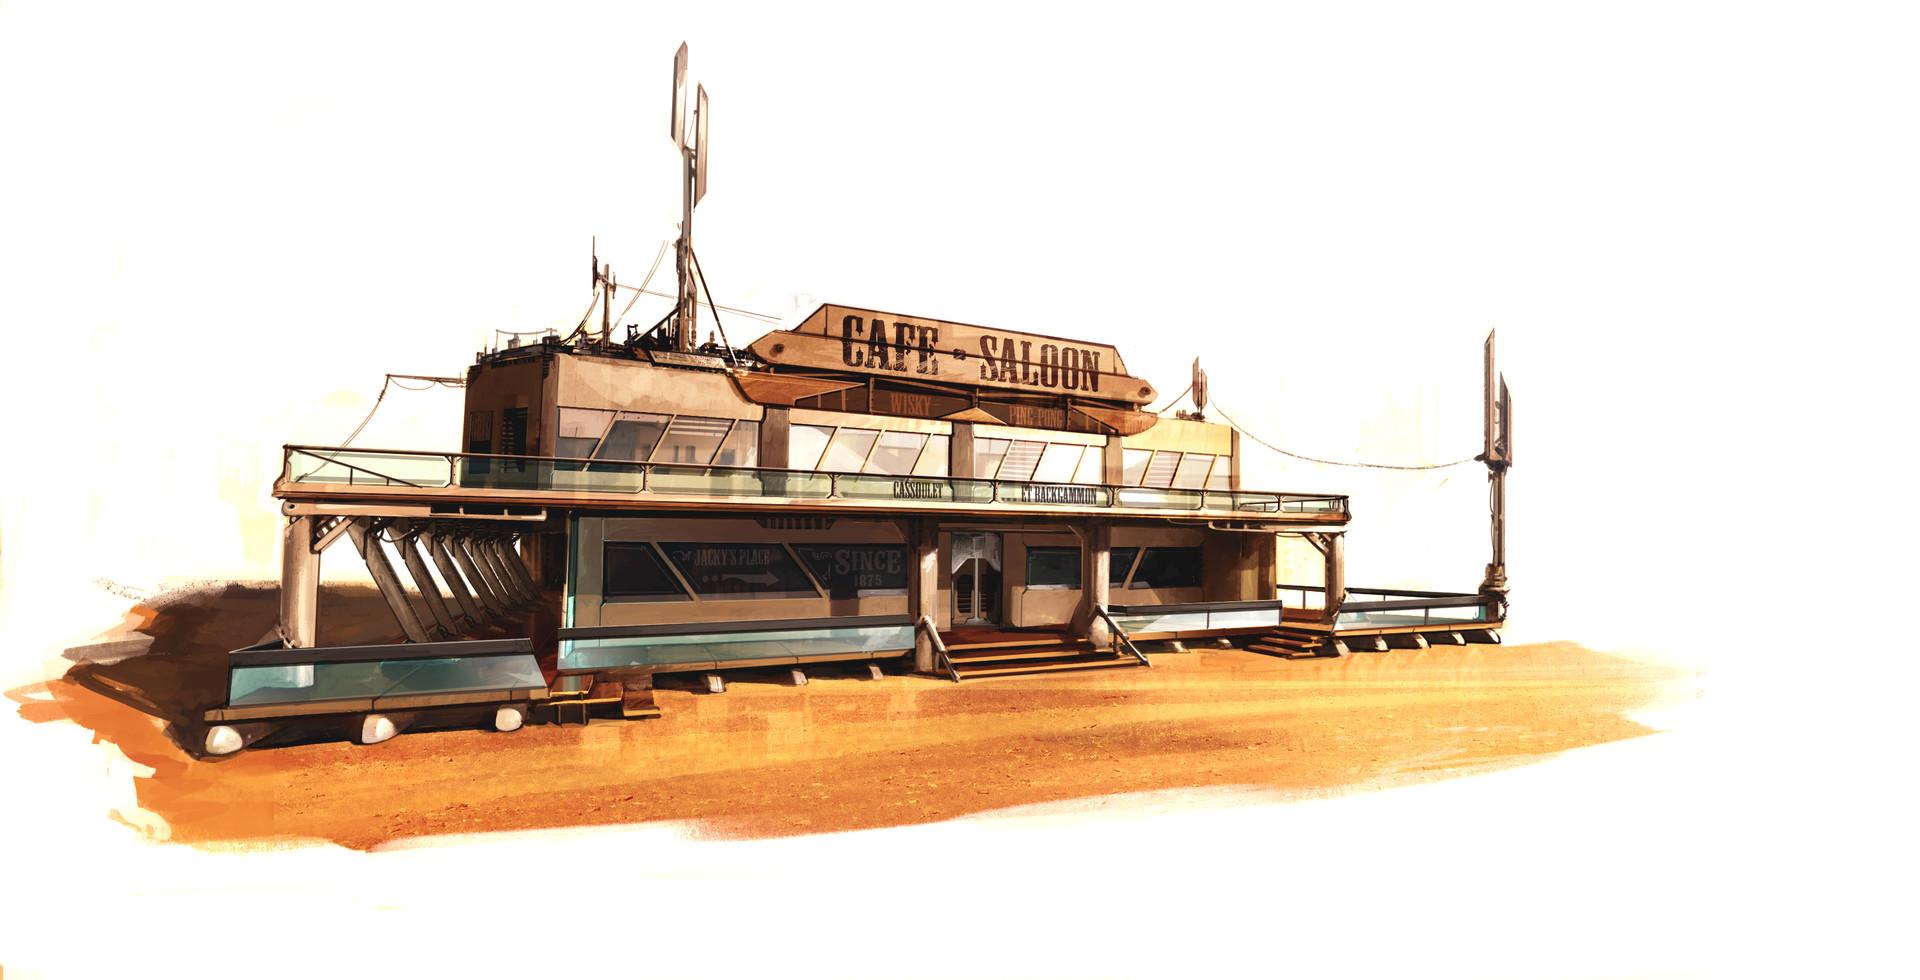 Nicolas petrimaux concept saloon ext2